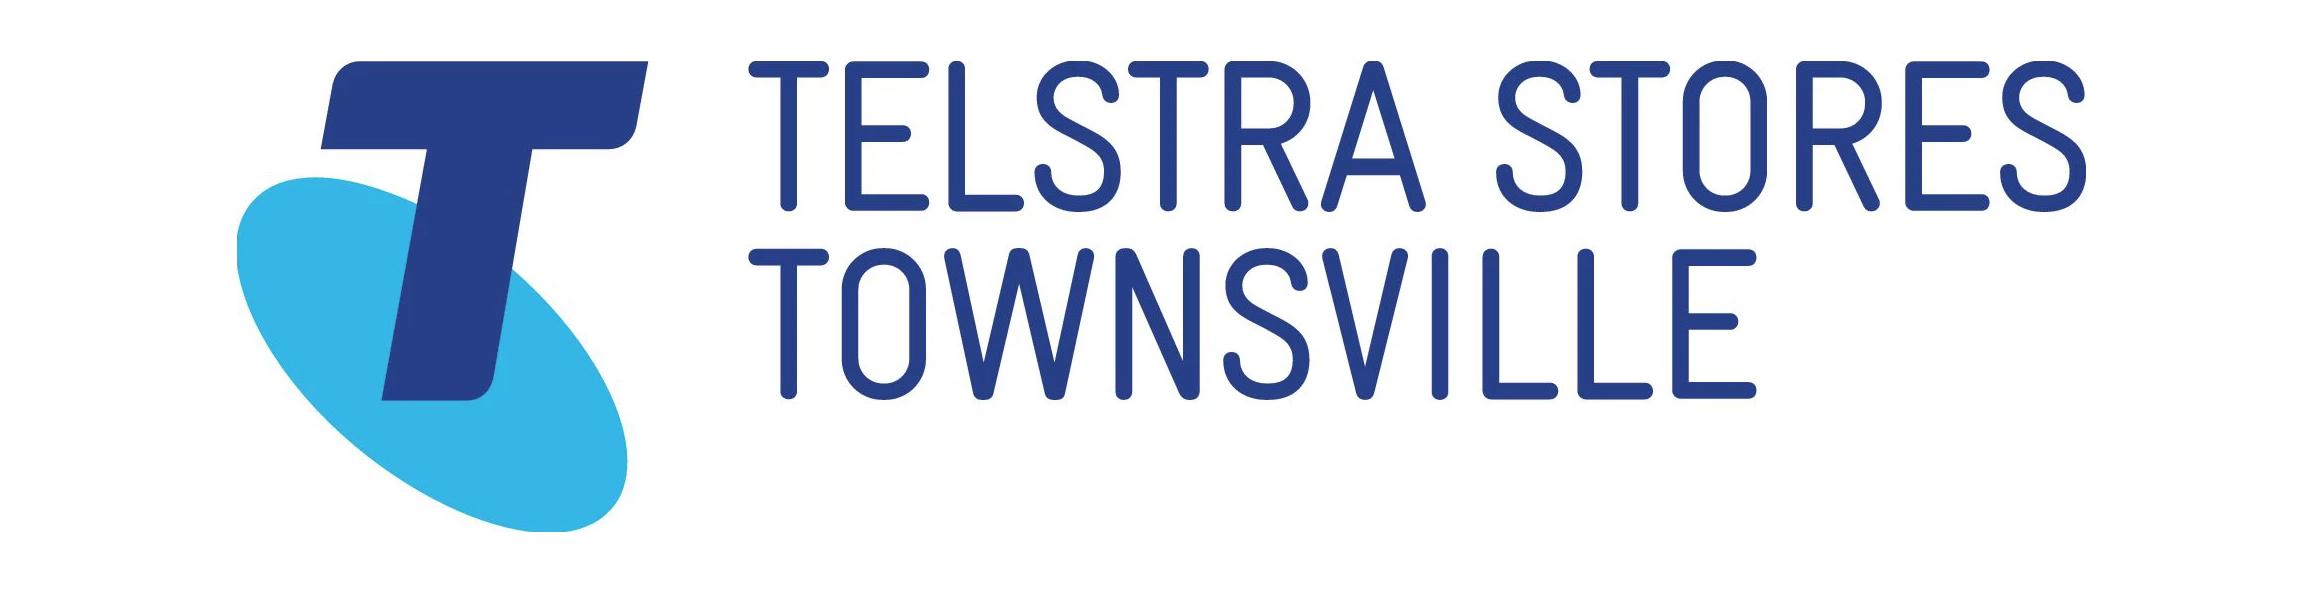 telsta-store-townsville